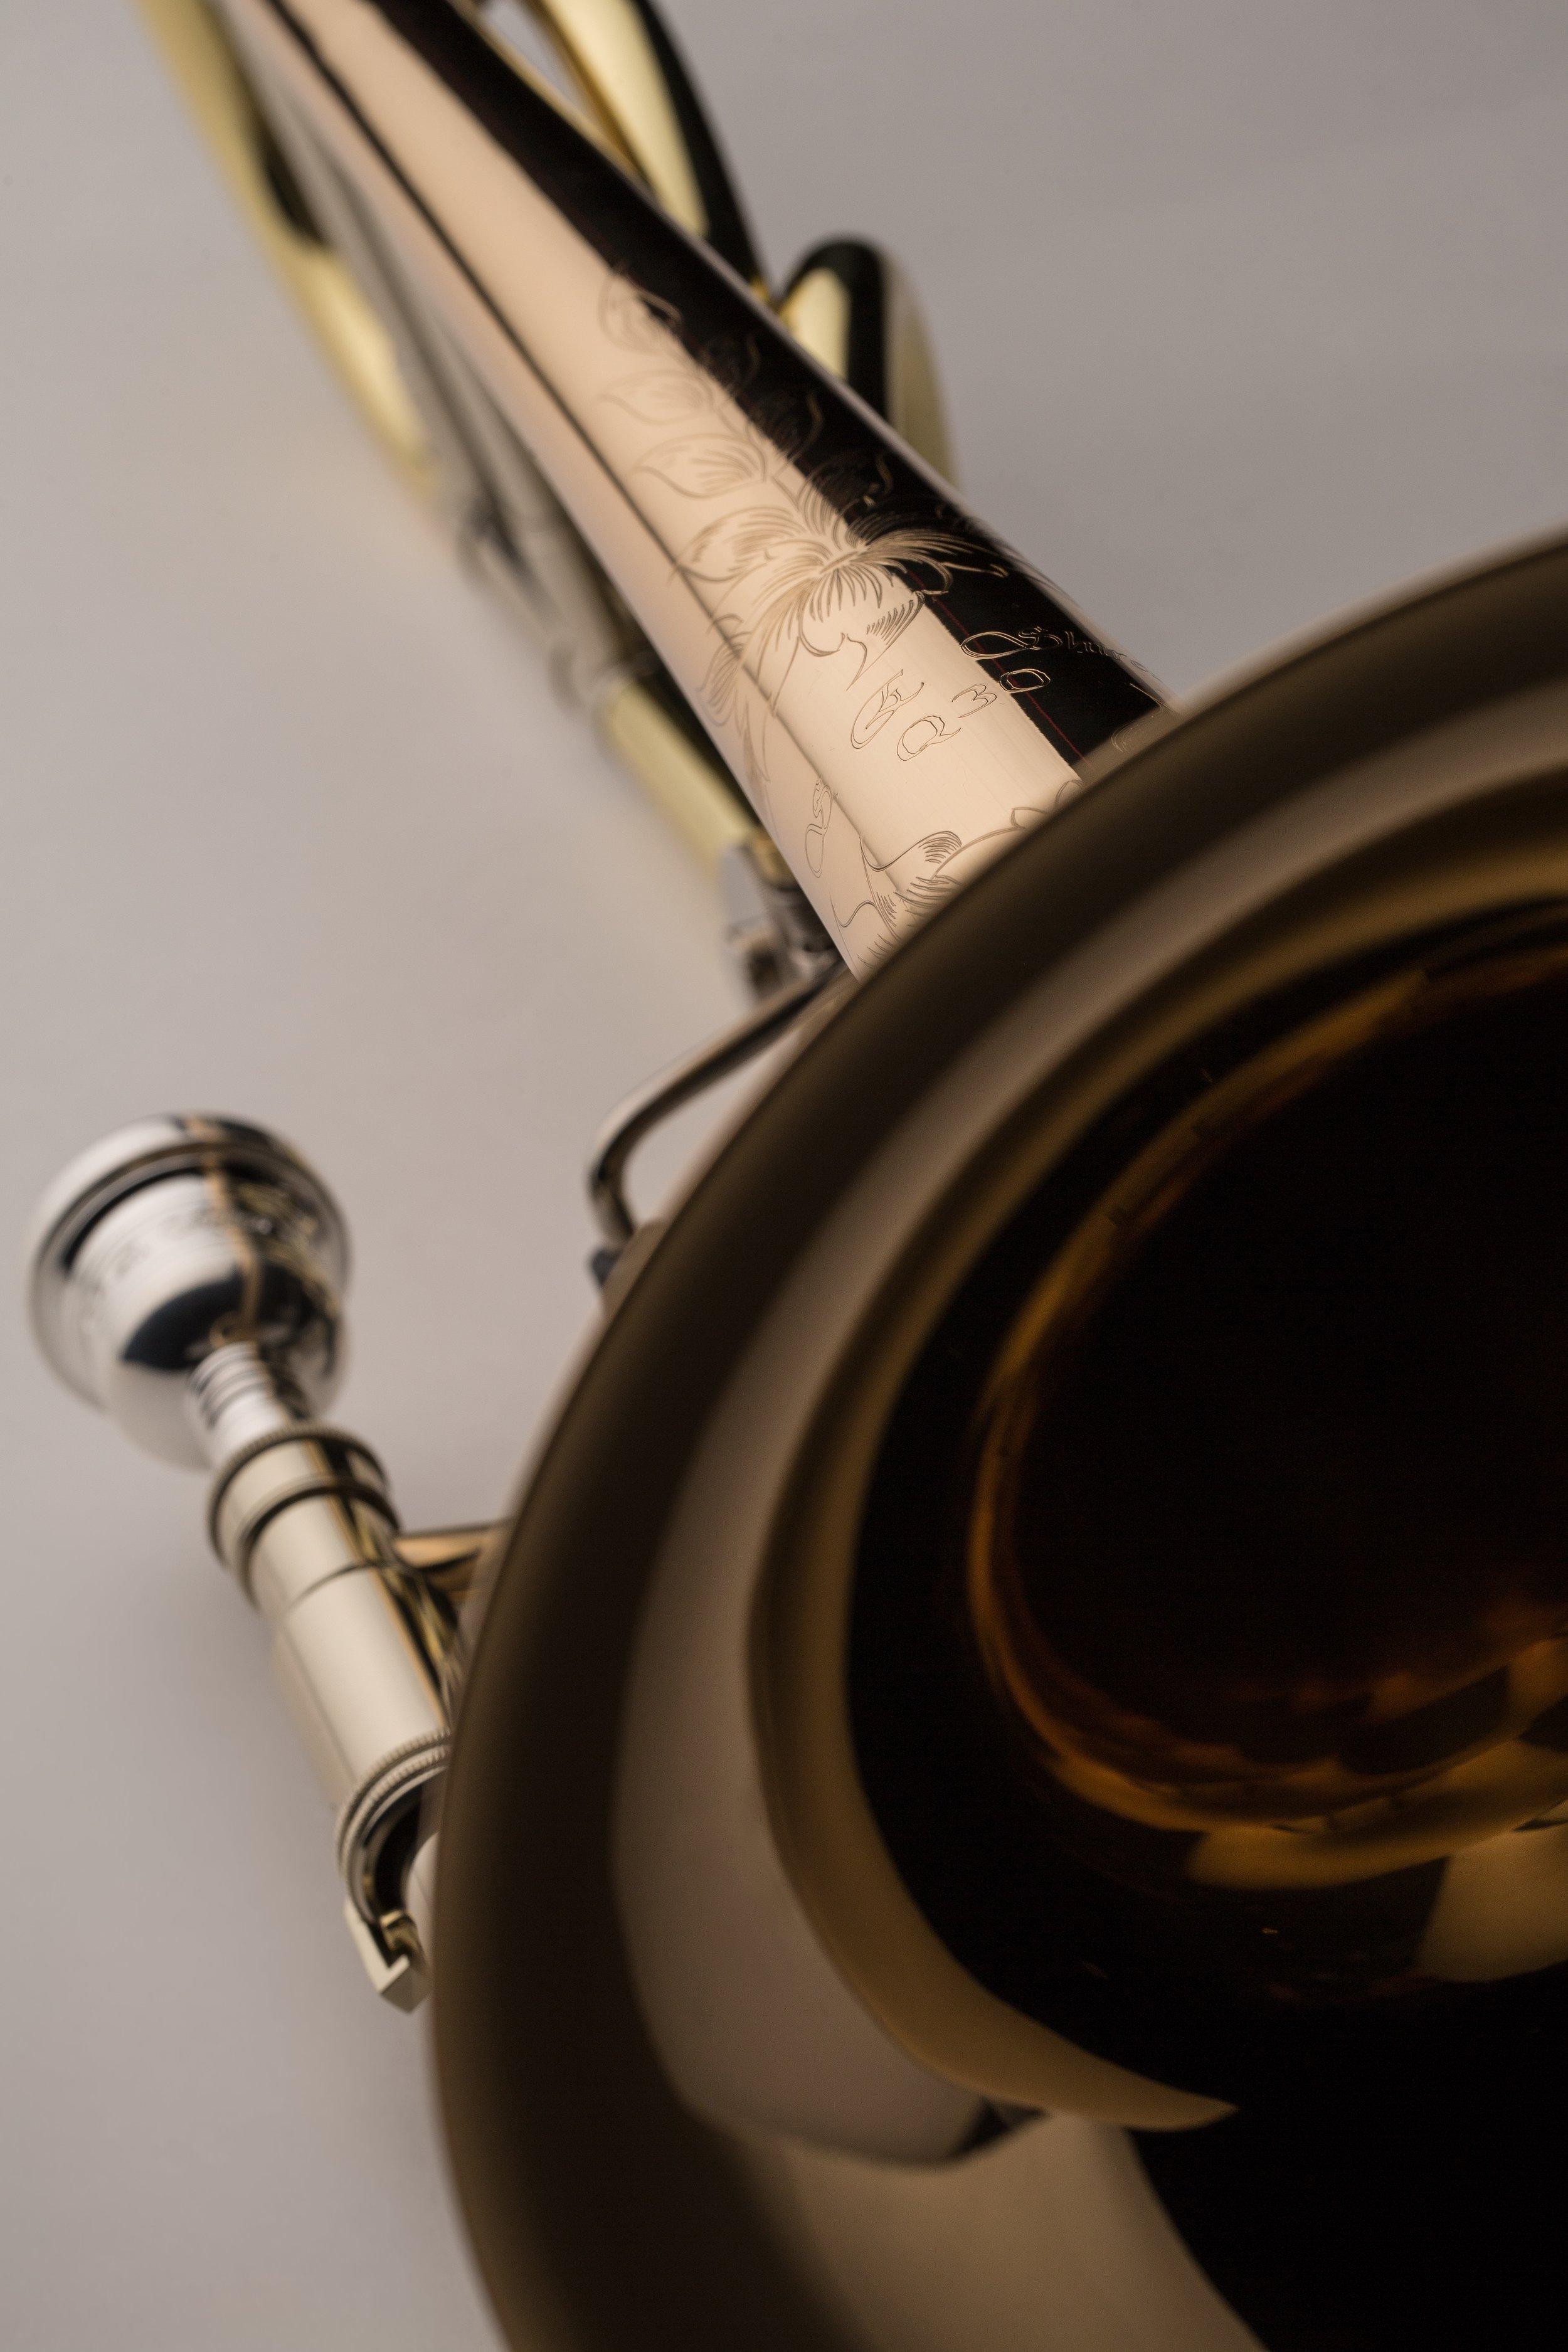 Shires_Trombone_TBQ30GR_CU_Bell_2_0718.jpg